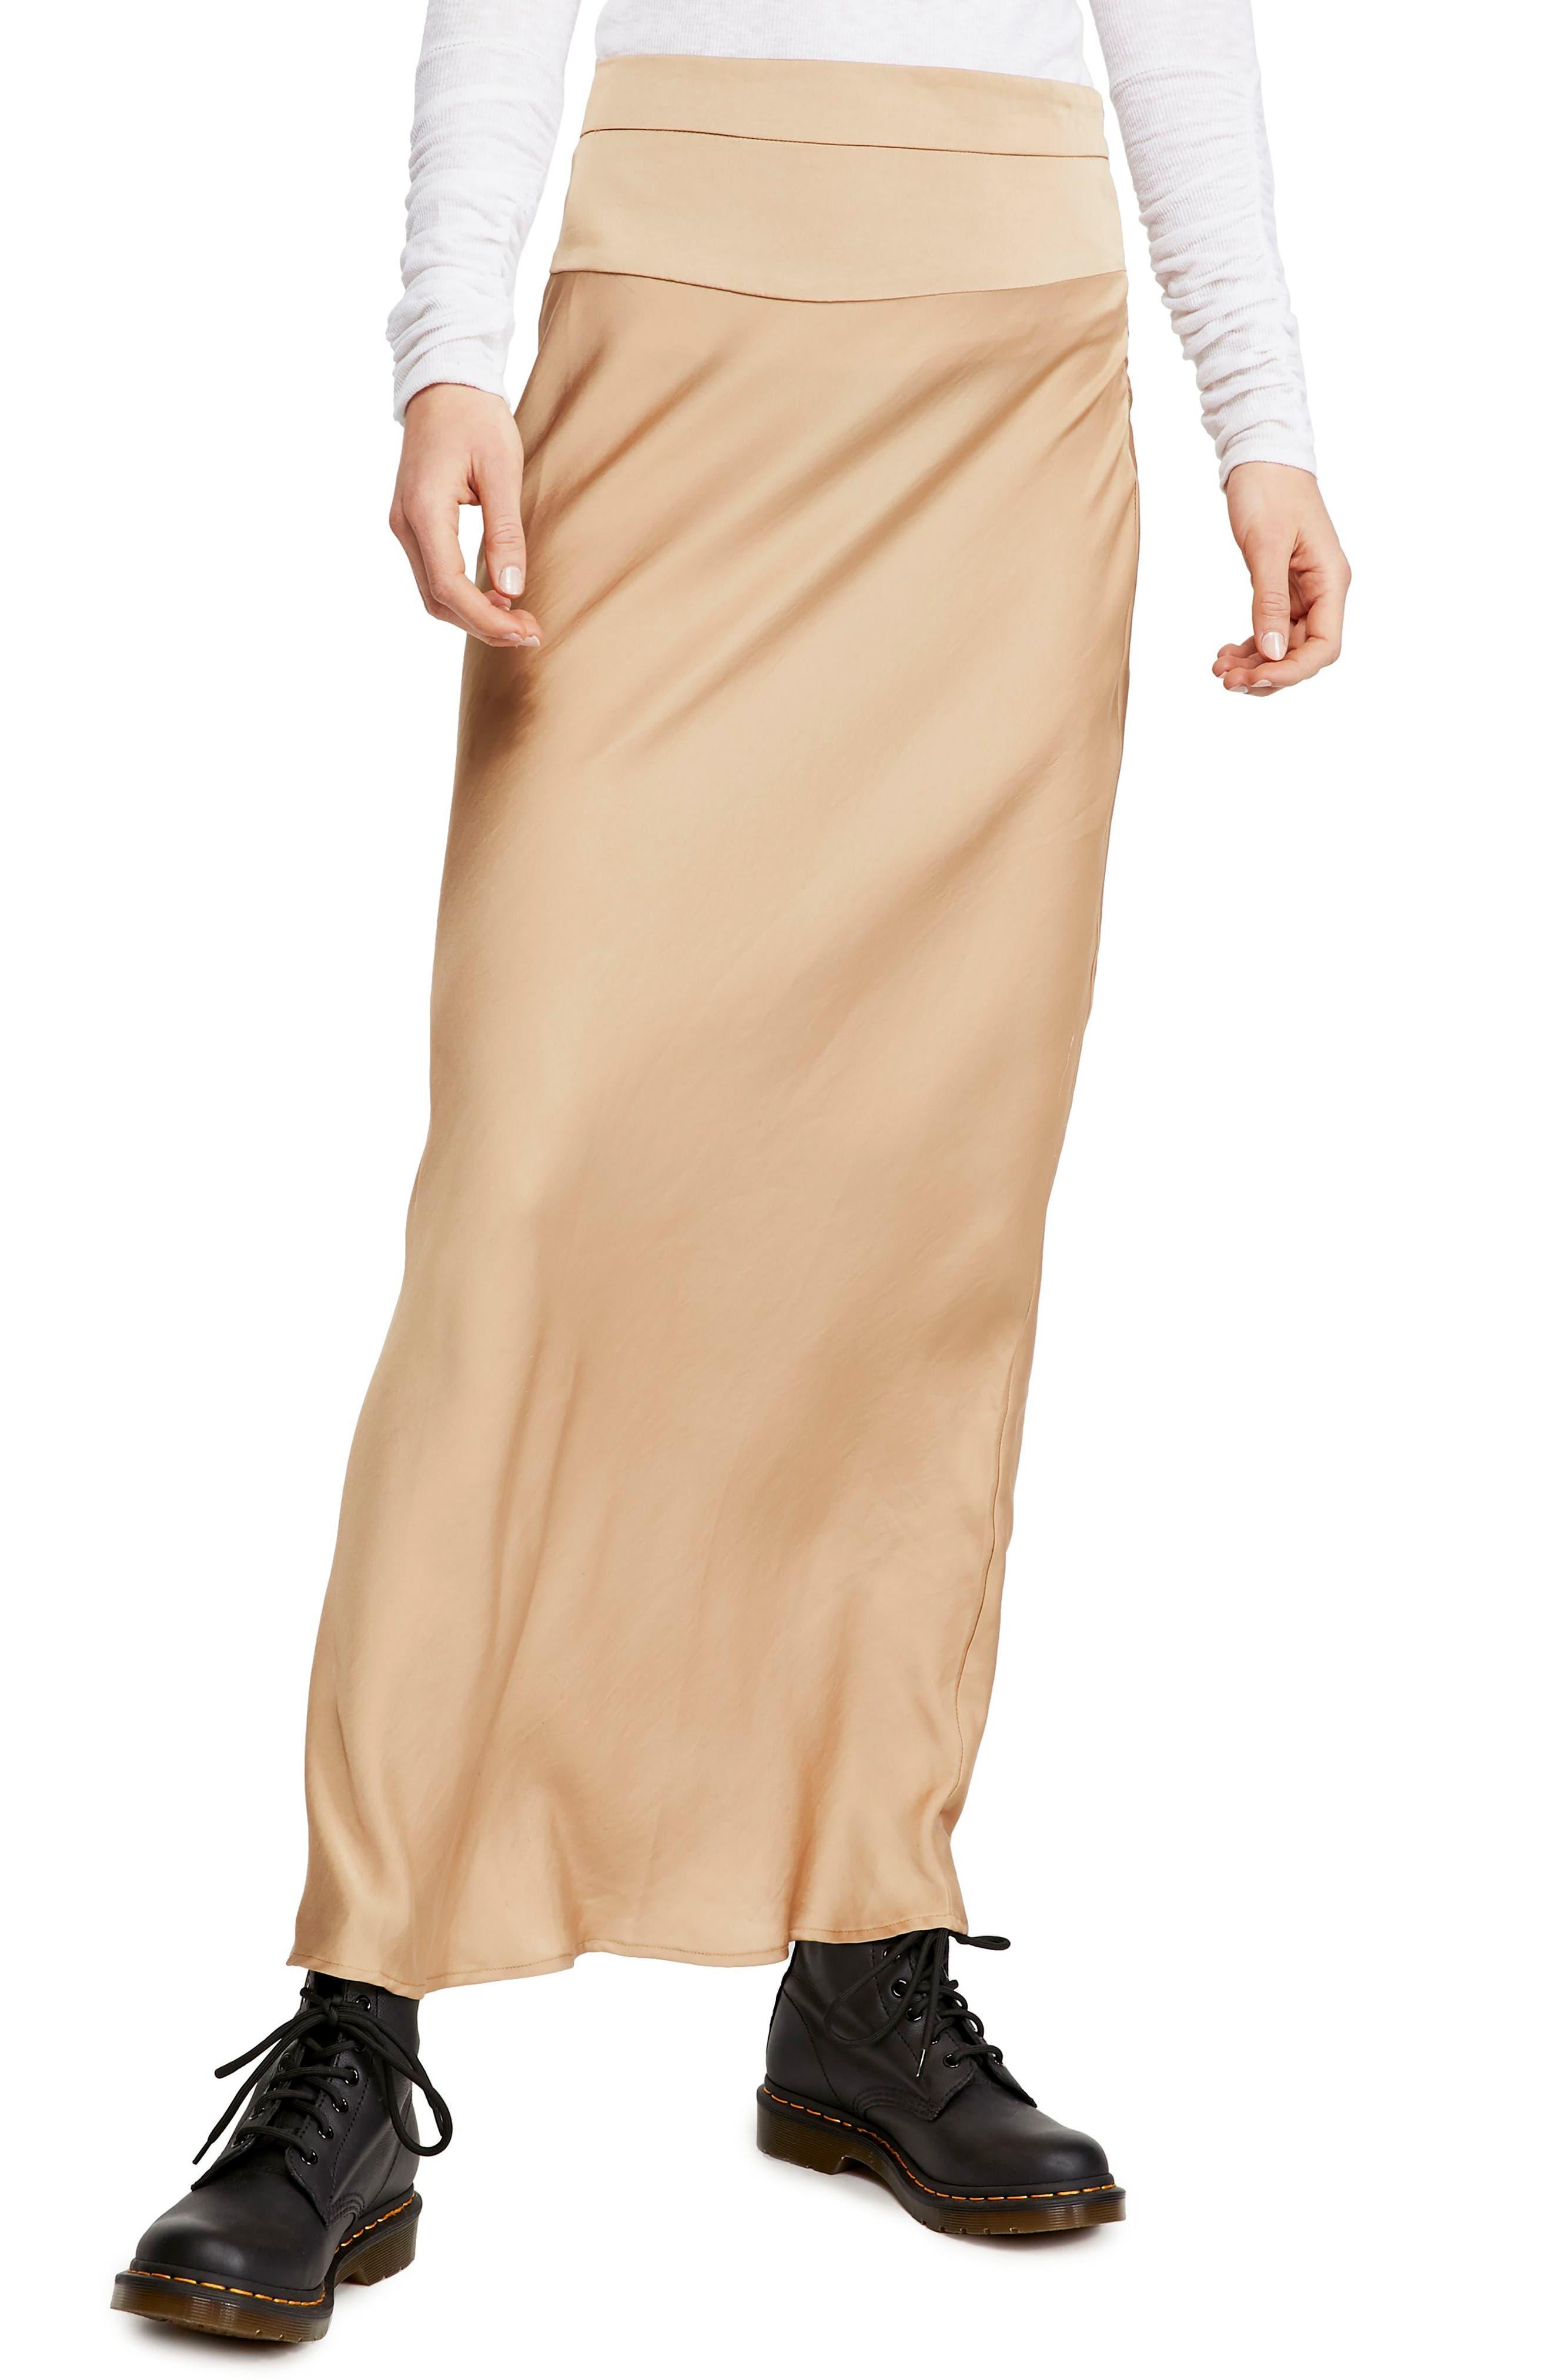 Free People Normani Bias Cut Satin Skirt, Yellow